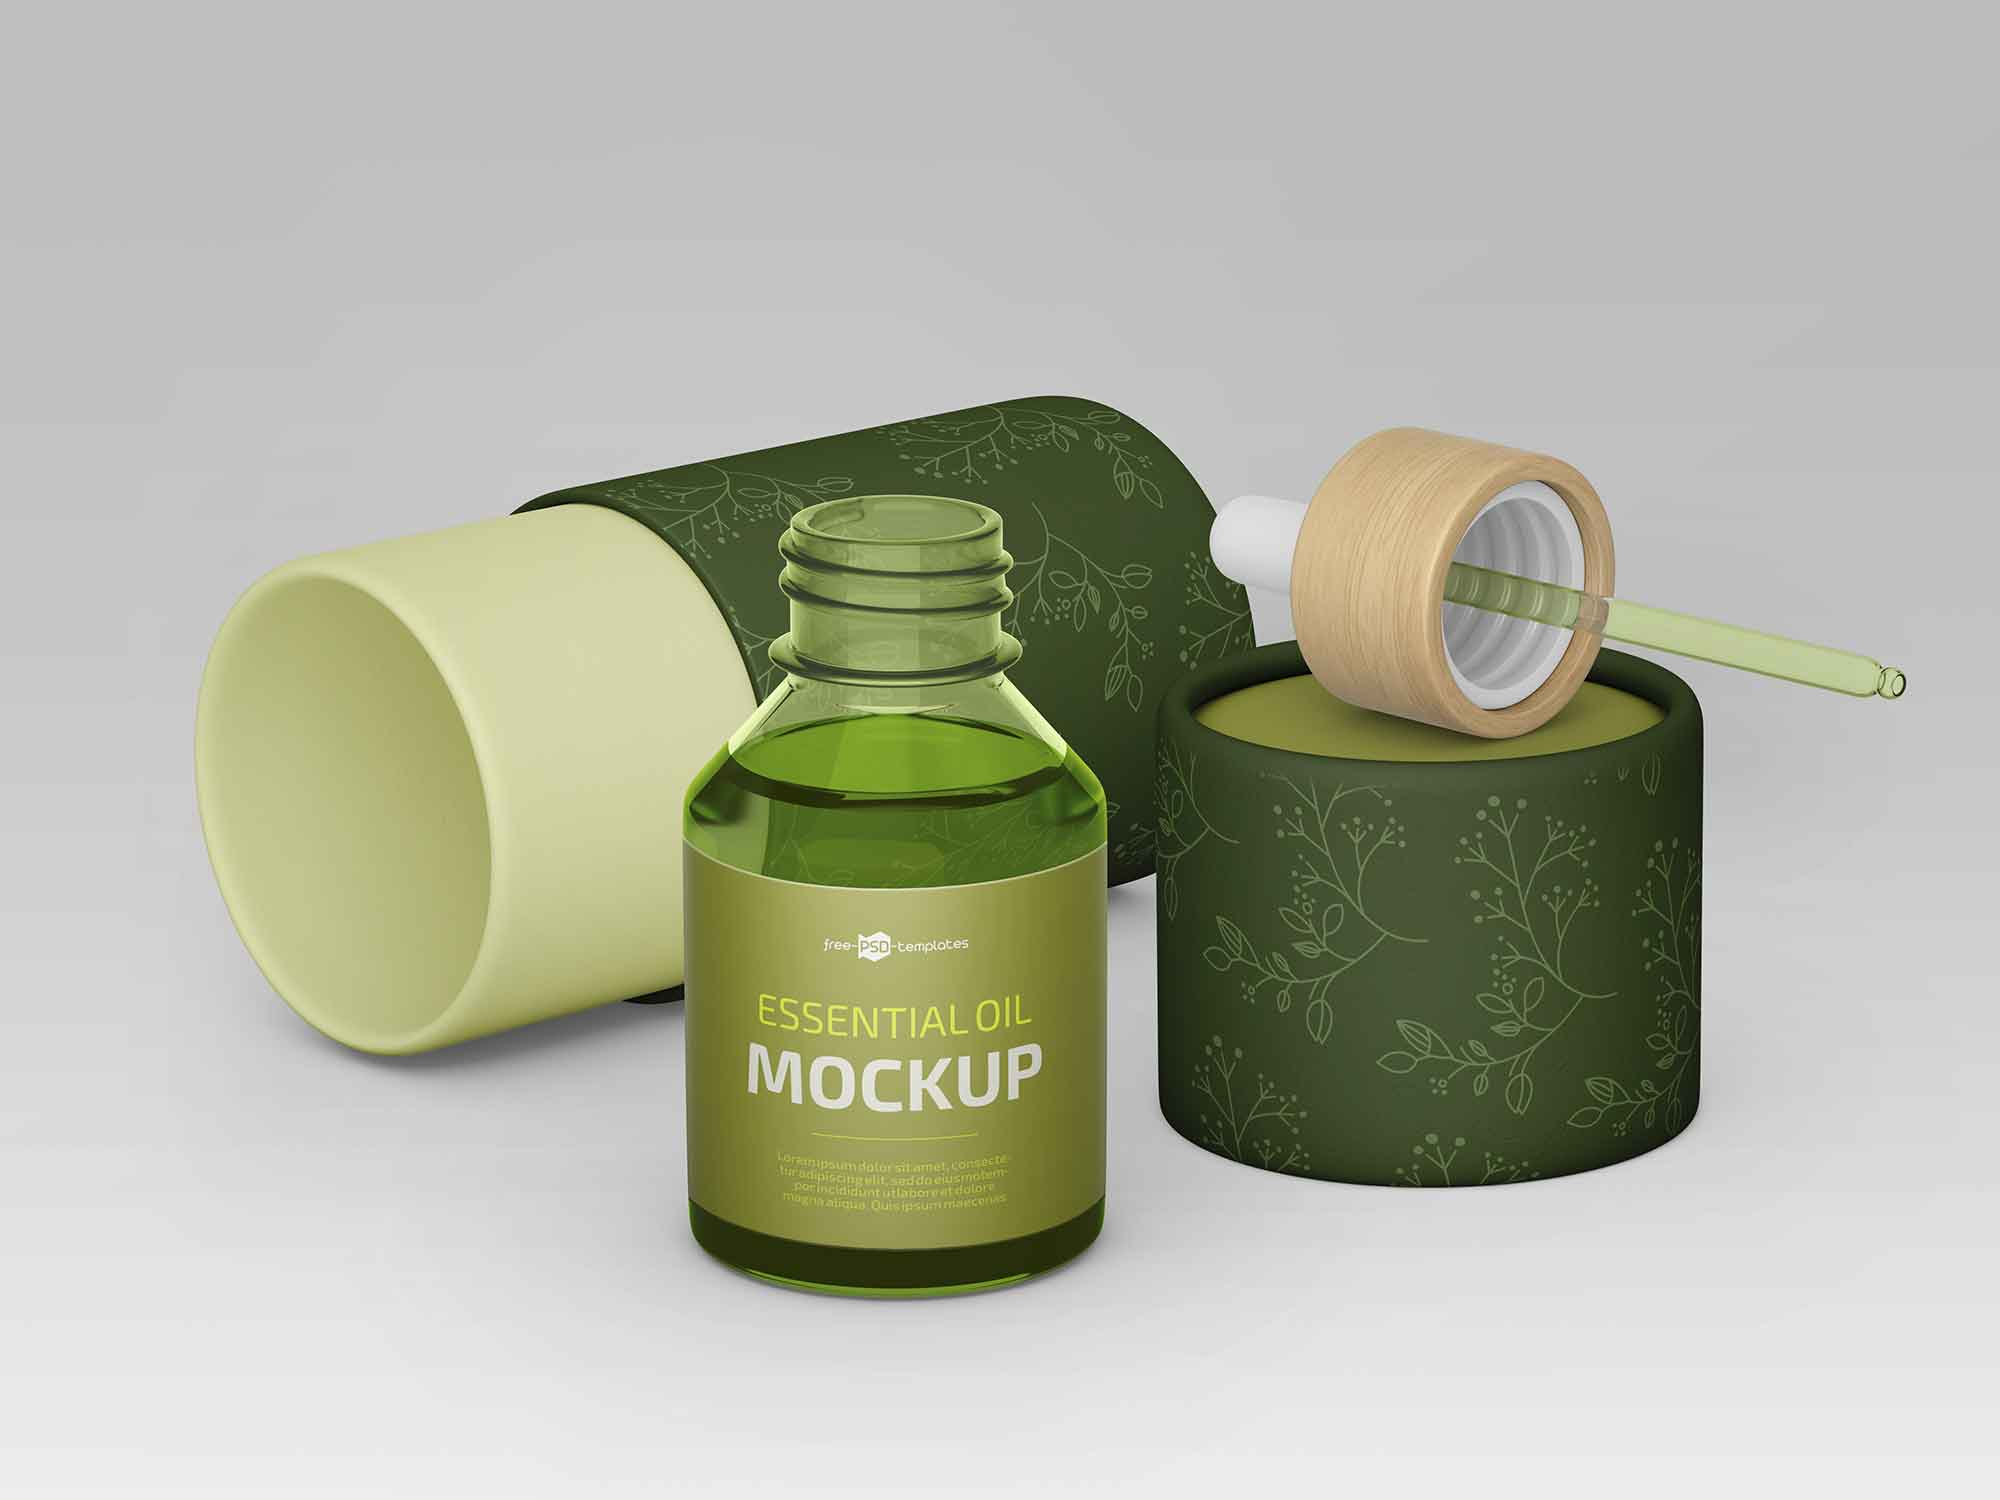 Essential Oil Mockup 2